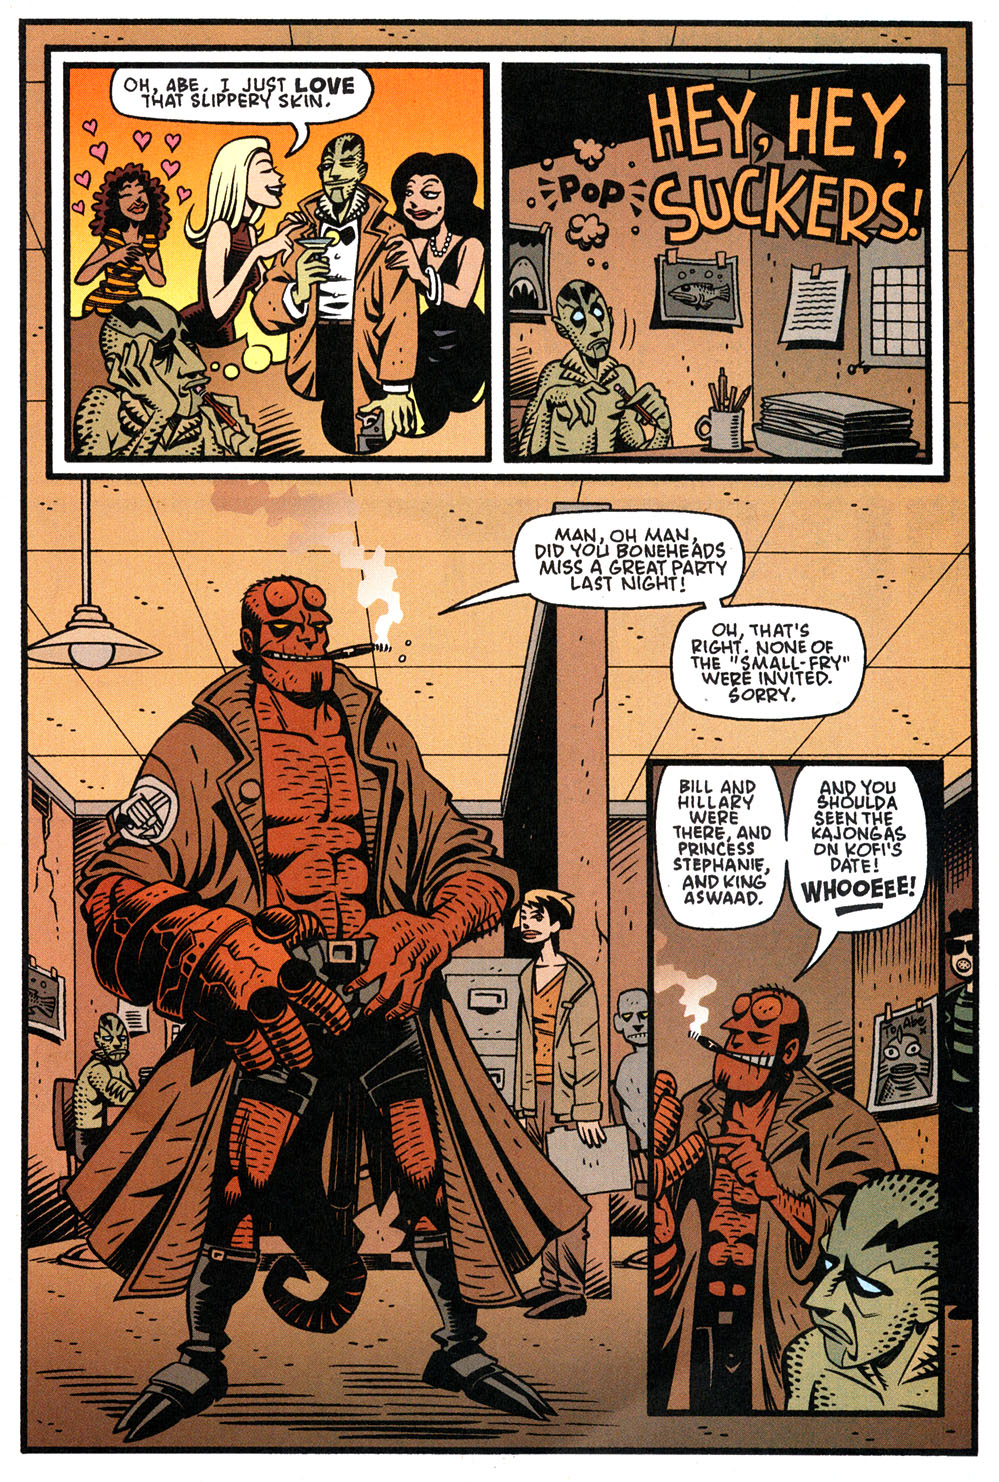 Read online Hellboy: Weird Tales comic -  Issue #4 - 19